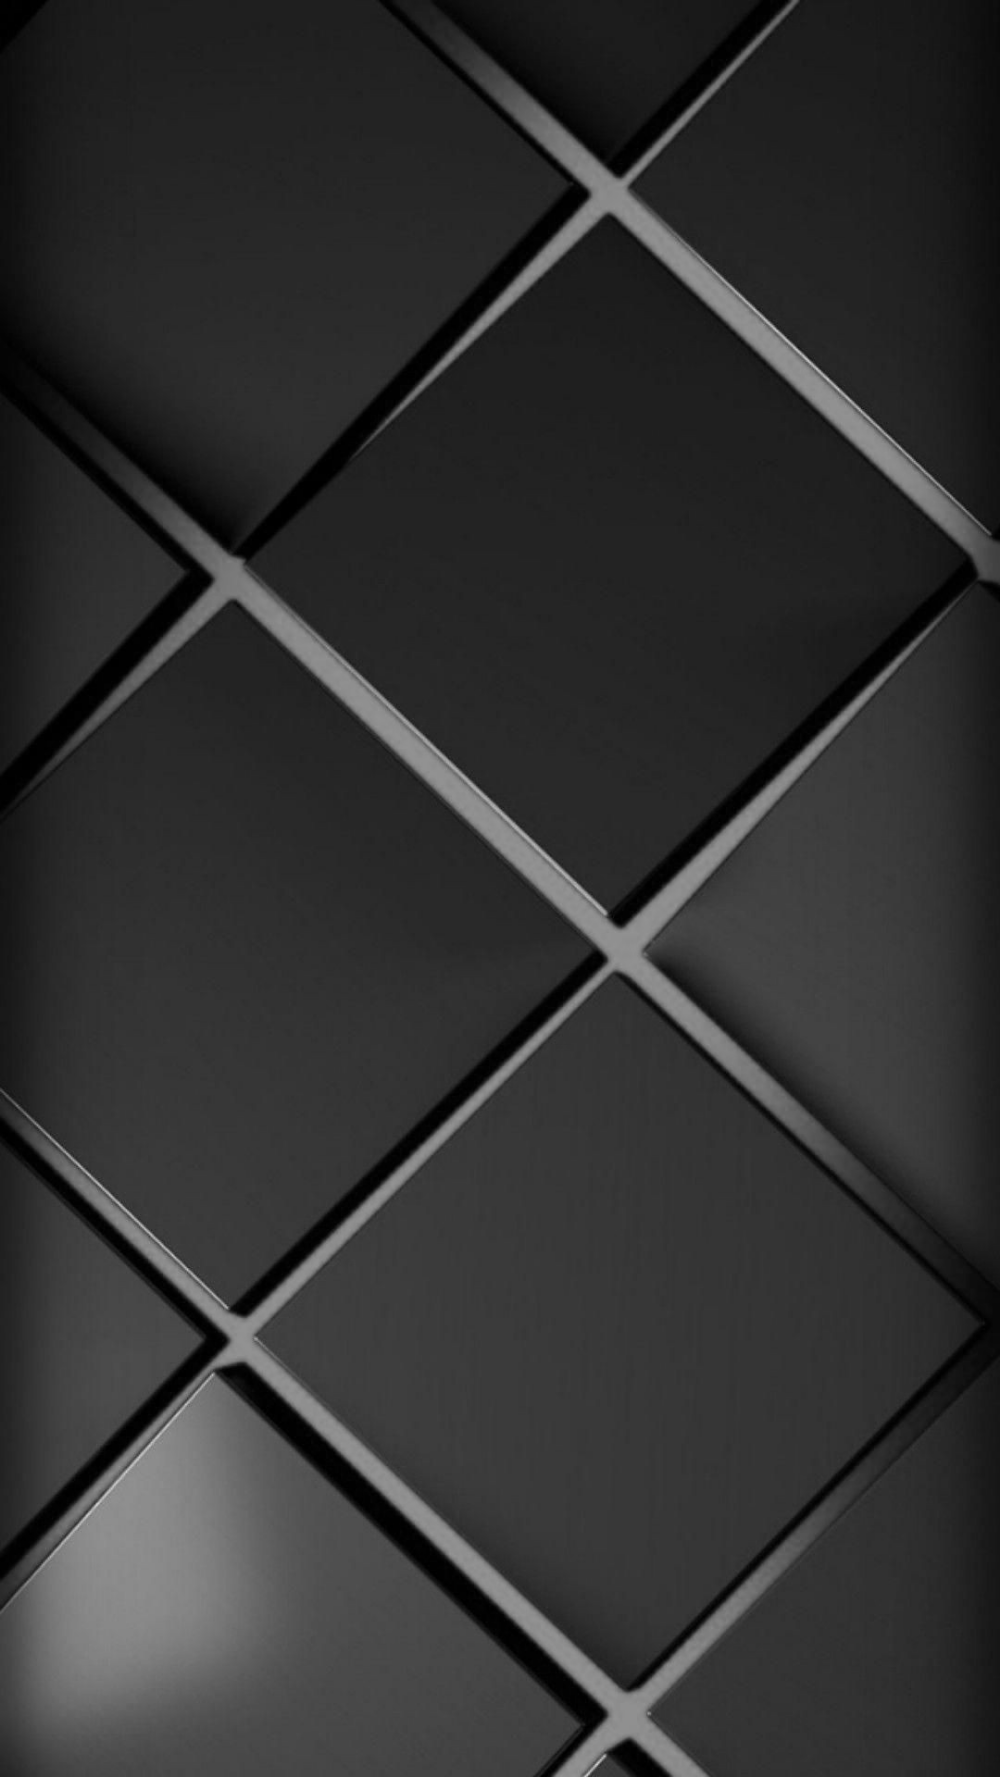 Download 52 Best 3d Dark Wallpapers For Mobile Ashueffects Dark Wallpaper Mobile Wallpaper Wallpaper